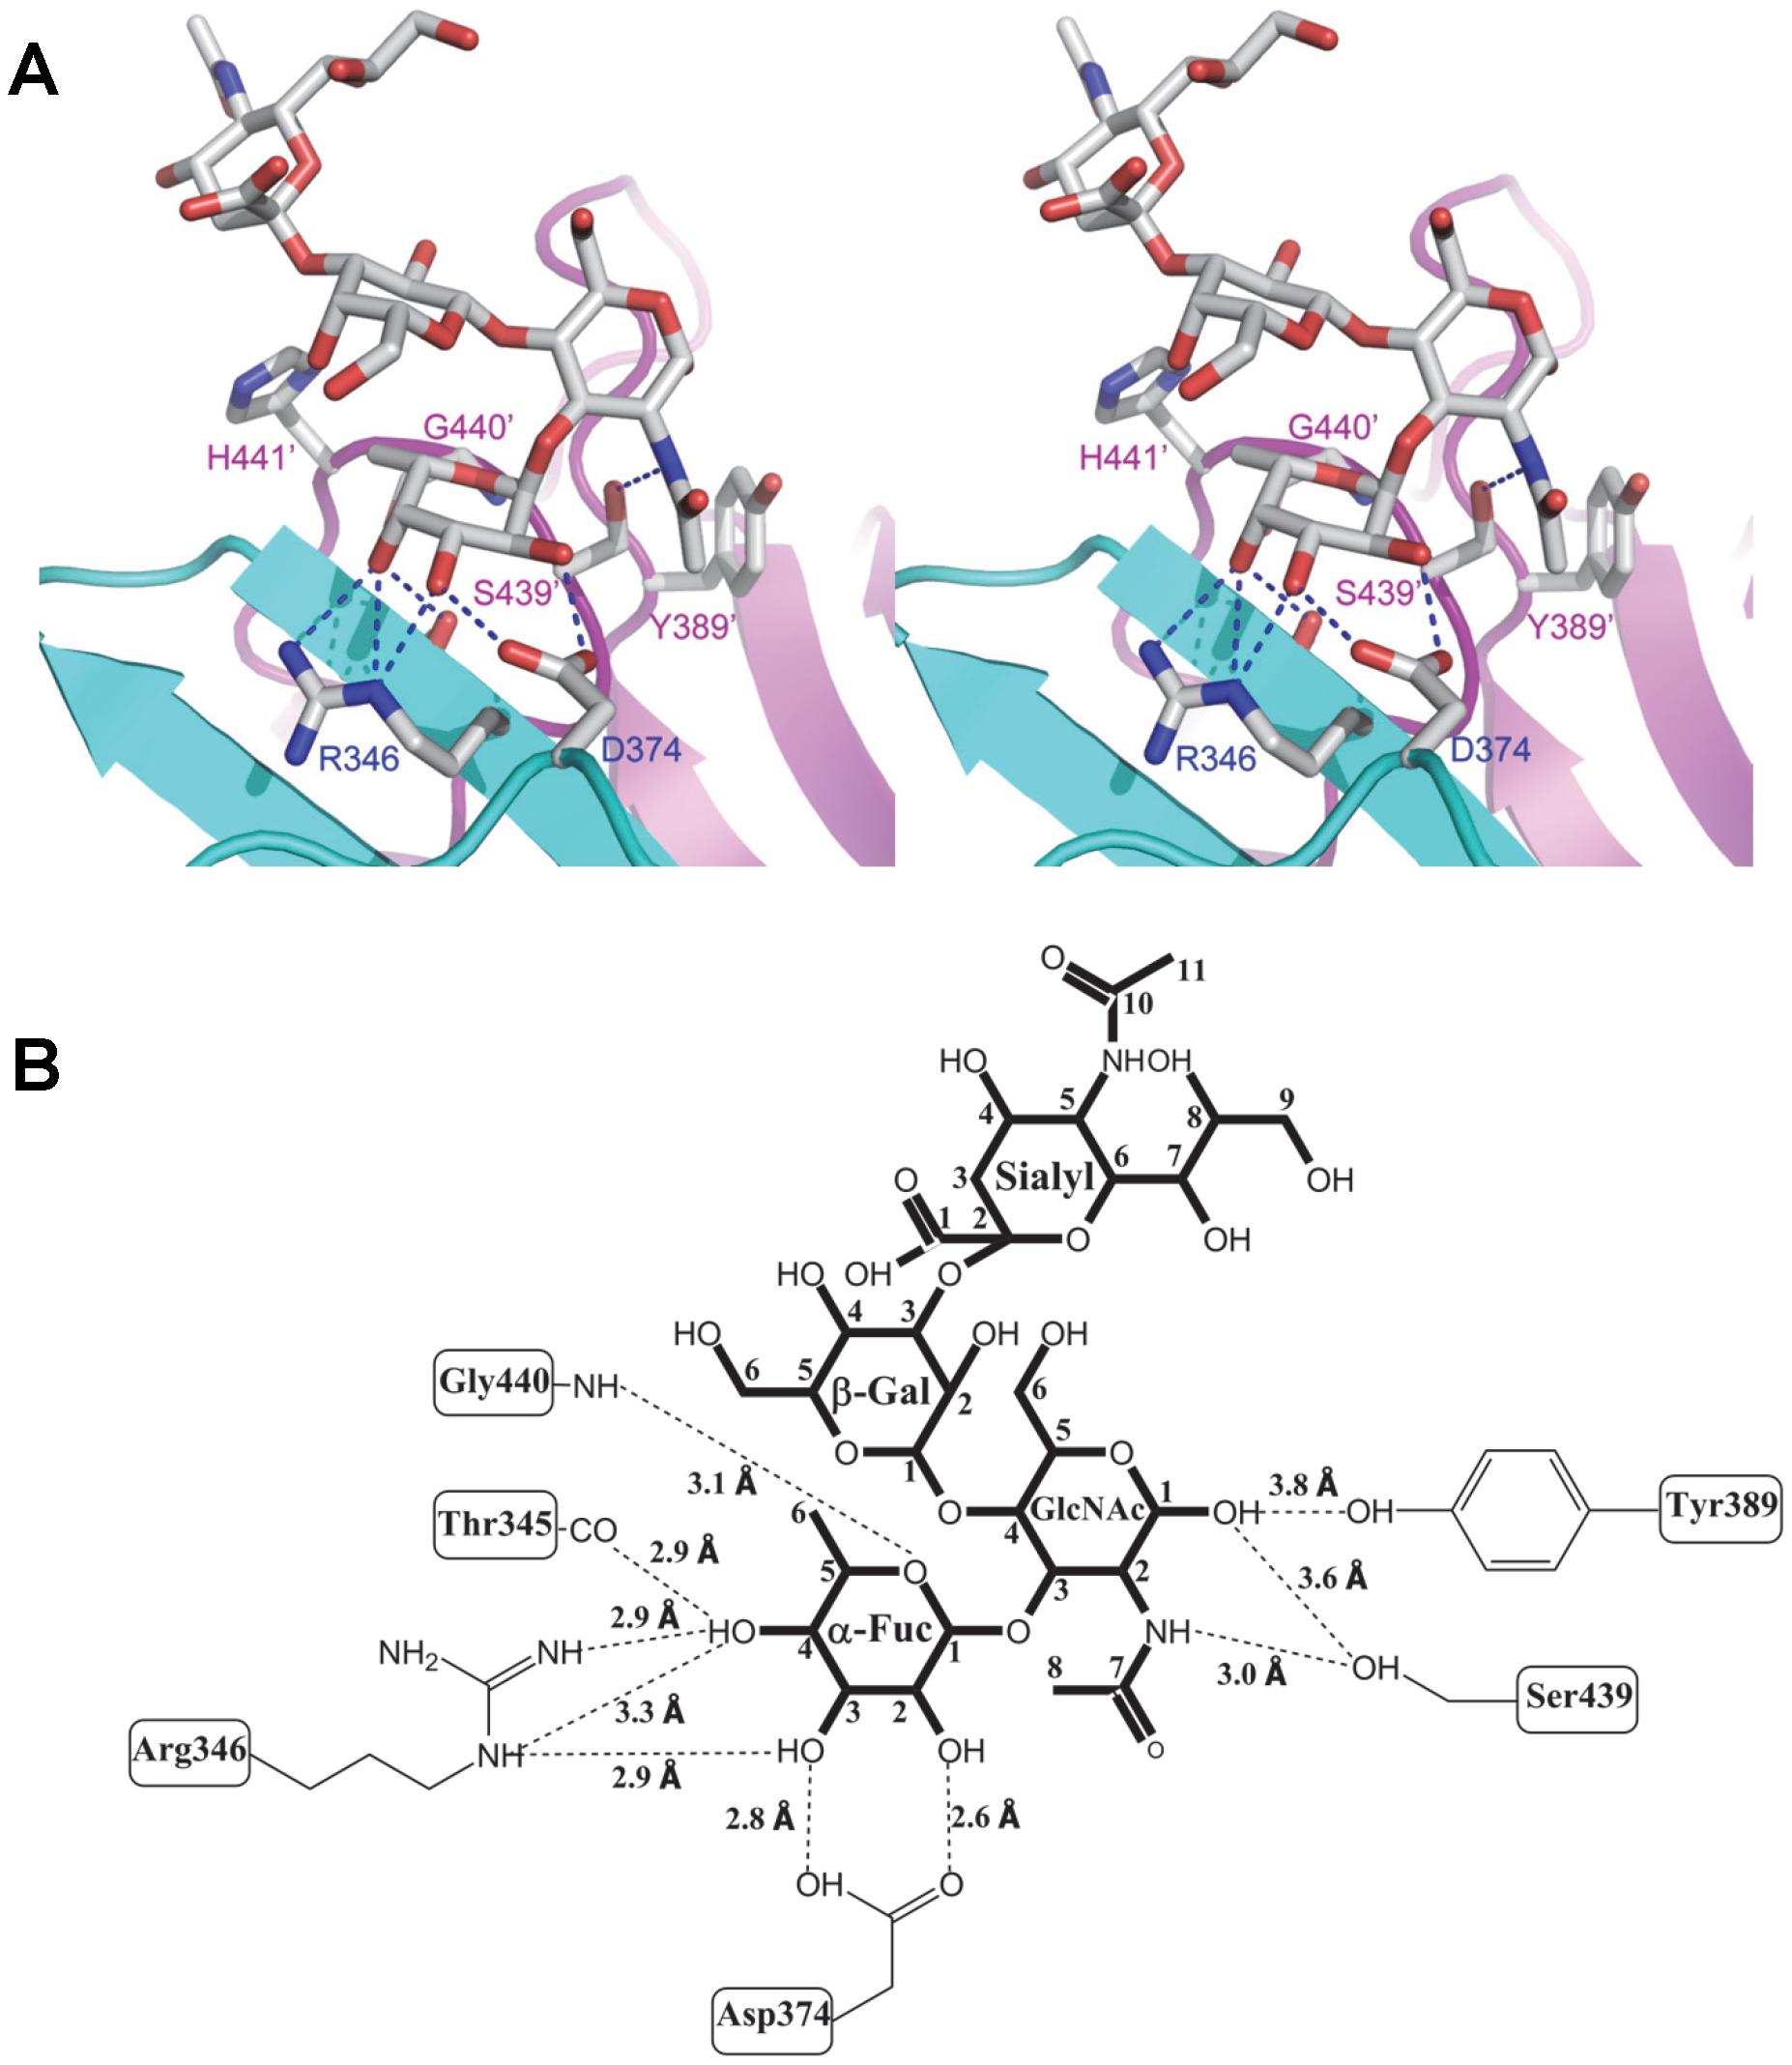 Extensive interaction network between VA207 P dimer and 3′ sialyl-Lewis X tetrasaccharide.